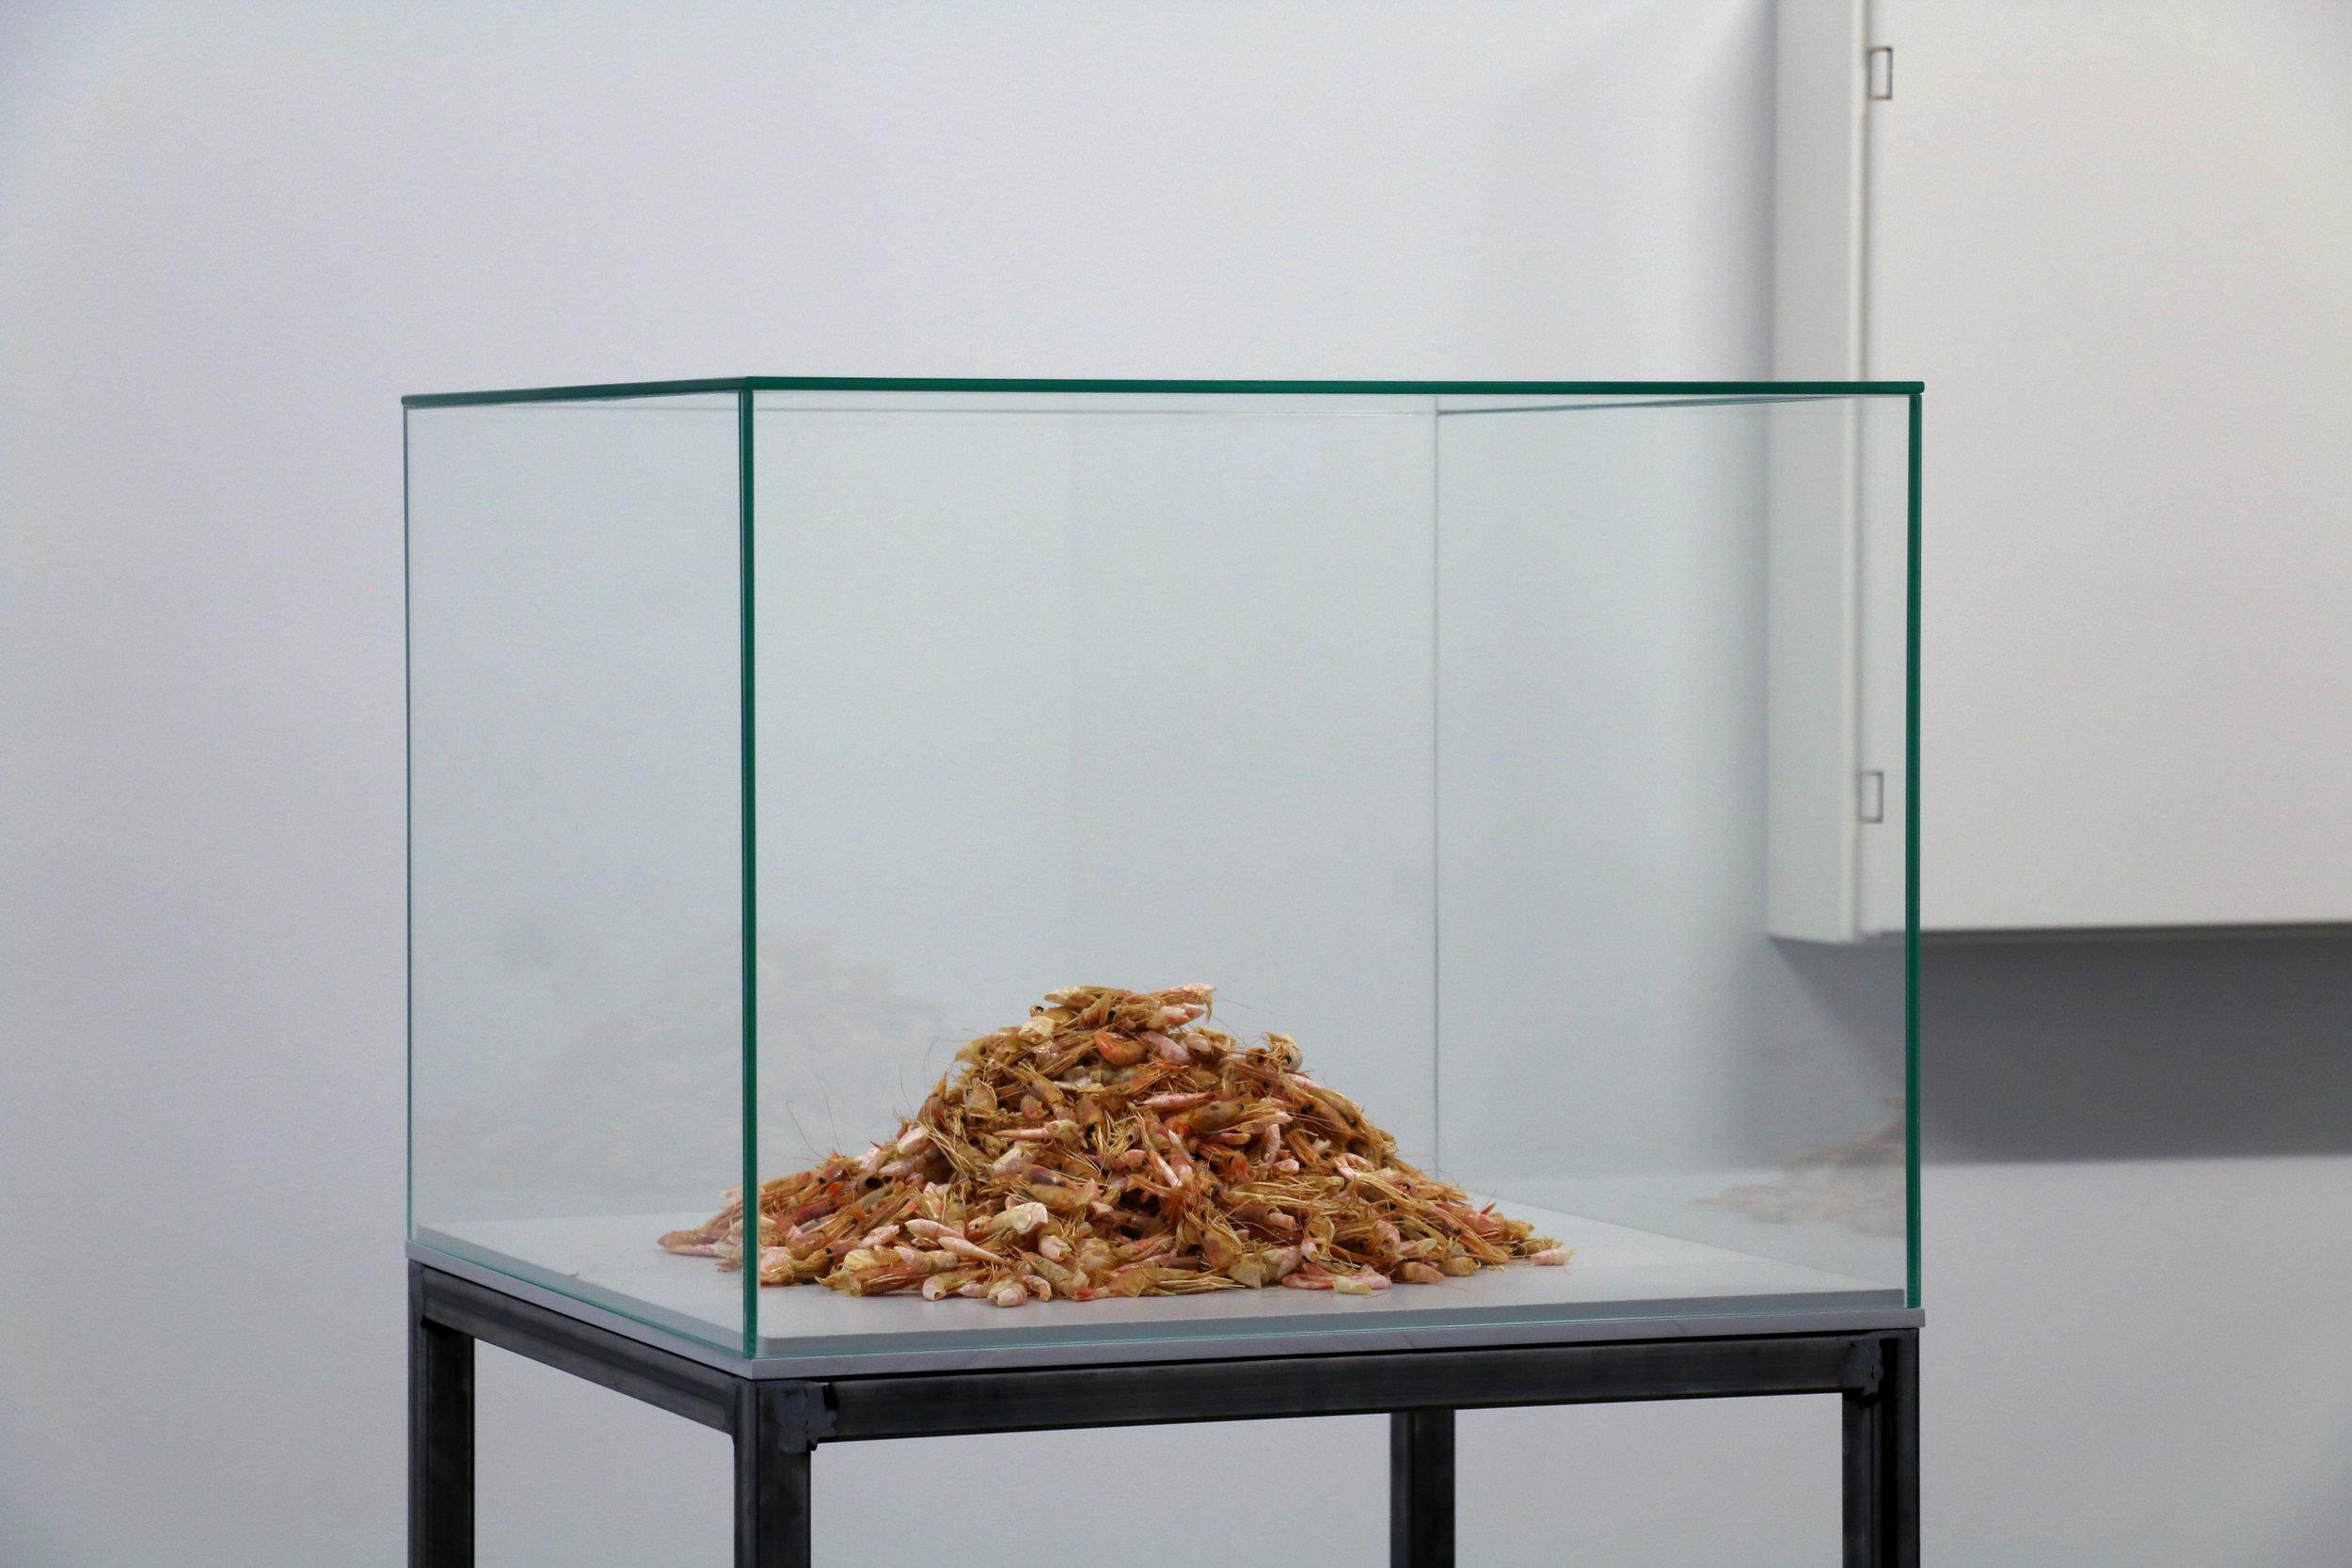 FRAUD (Fran Gallardo & Audrey Samson),  Shrimping under Working Conditions  (2017), DETAIL. INSTALLATIOn shot: Aage A. Mikalsen / Kunsthall Trondheim